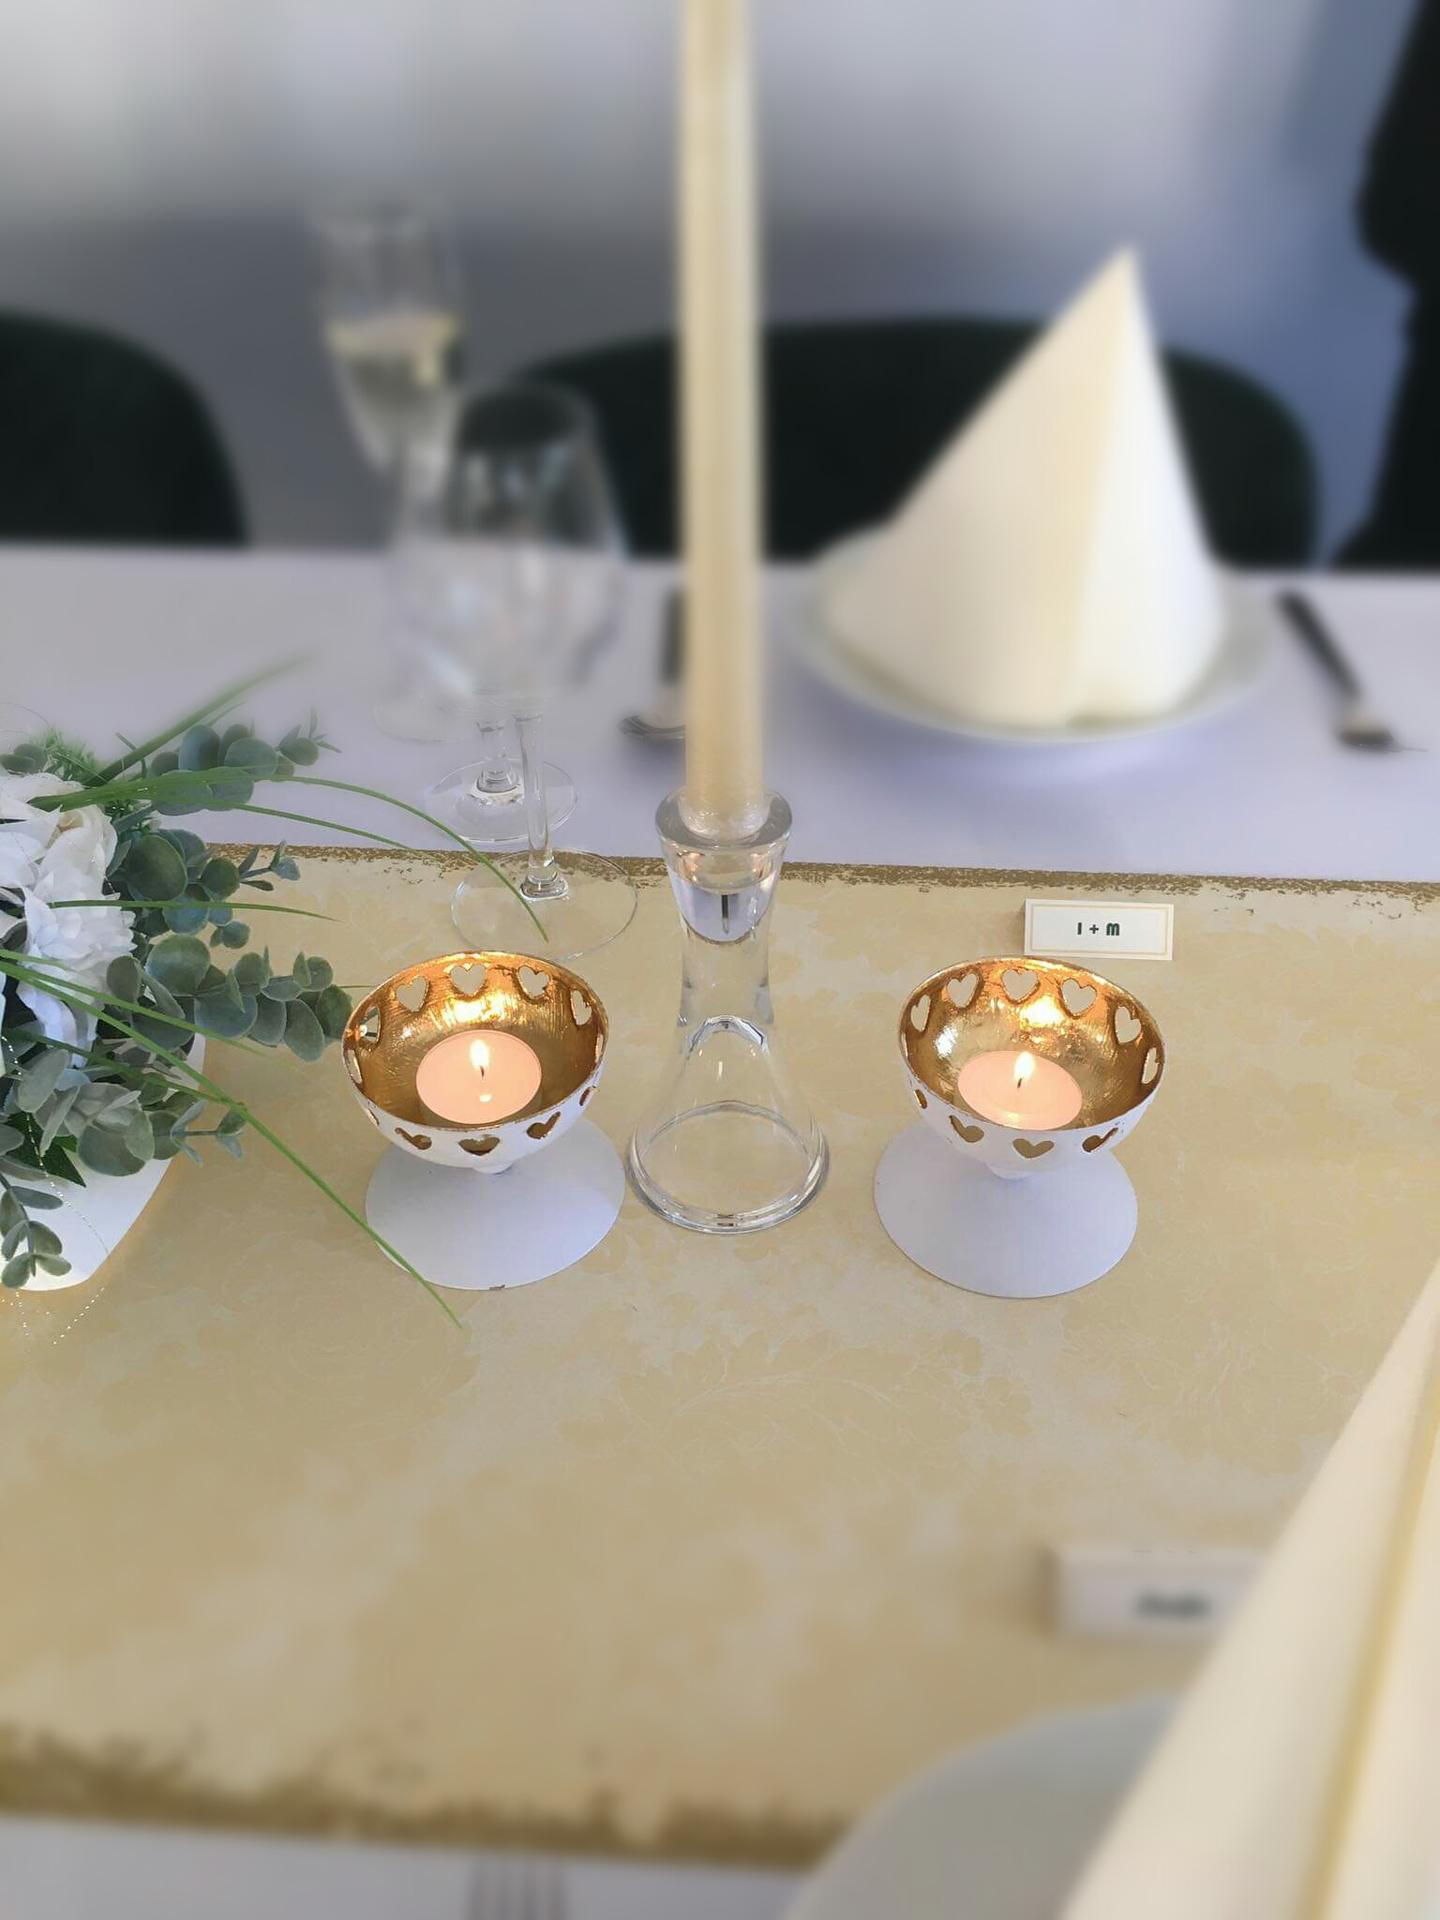 Svietniky a dekoracie na stoly